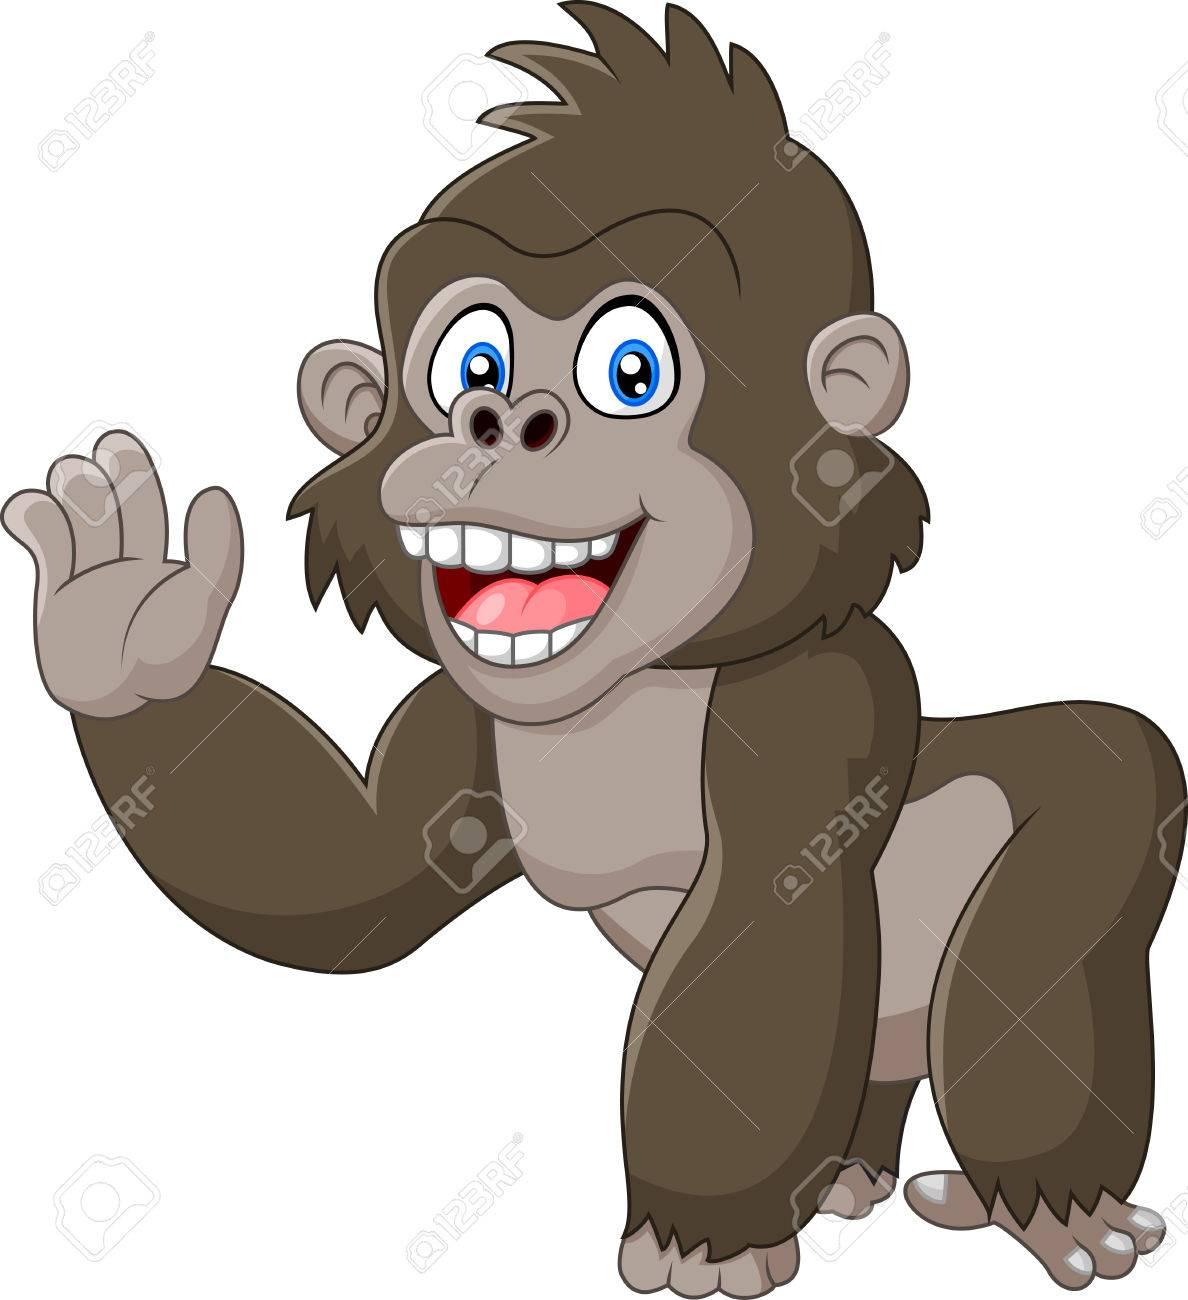 Funny gorilla waving hand.